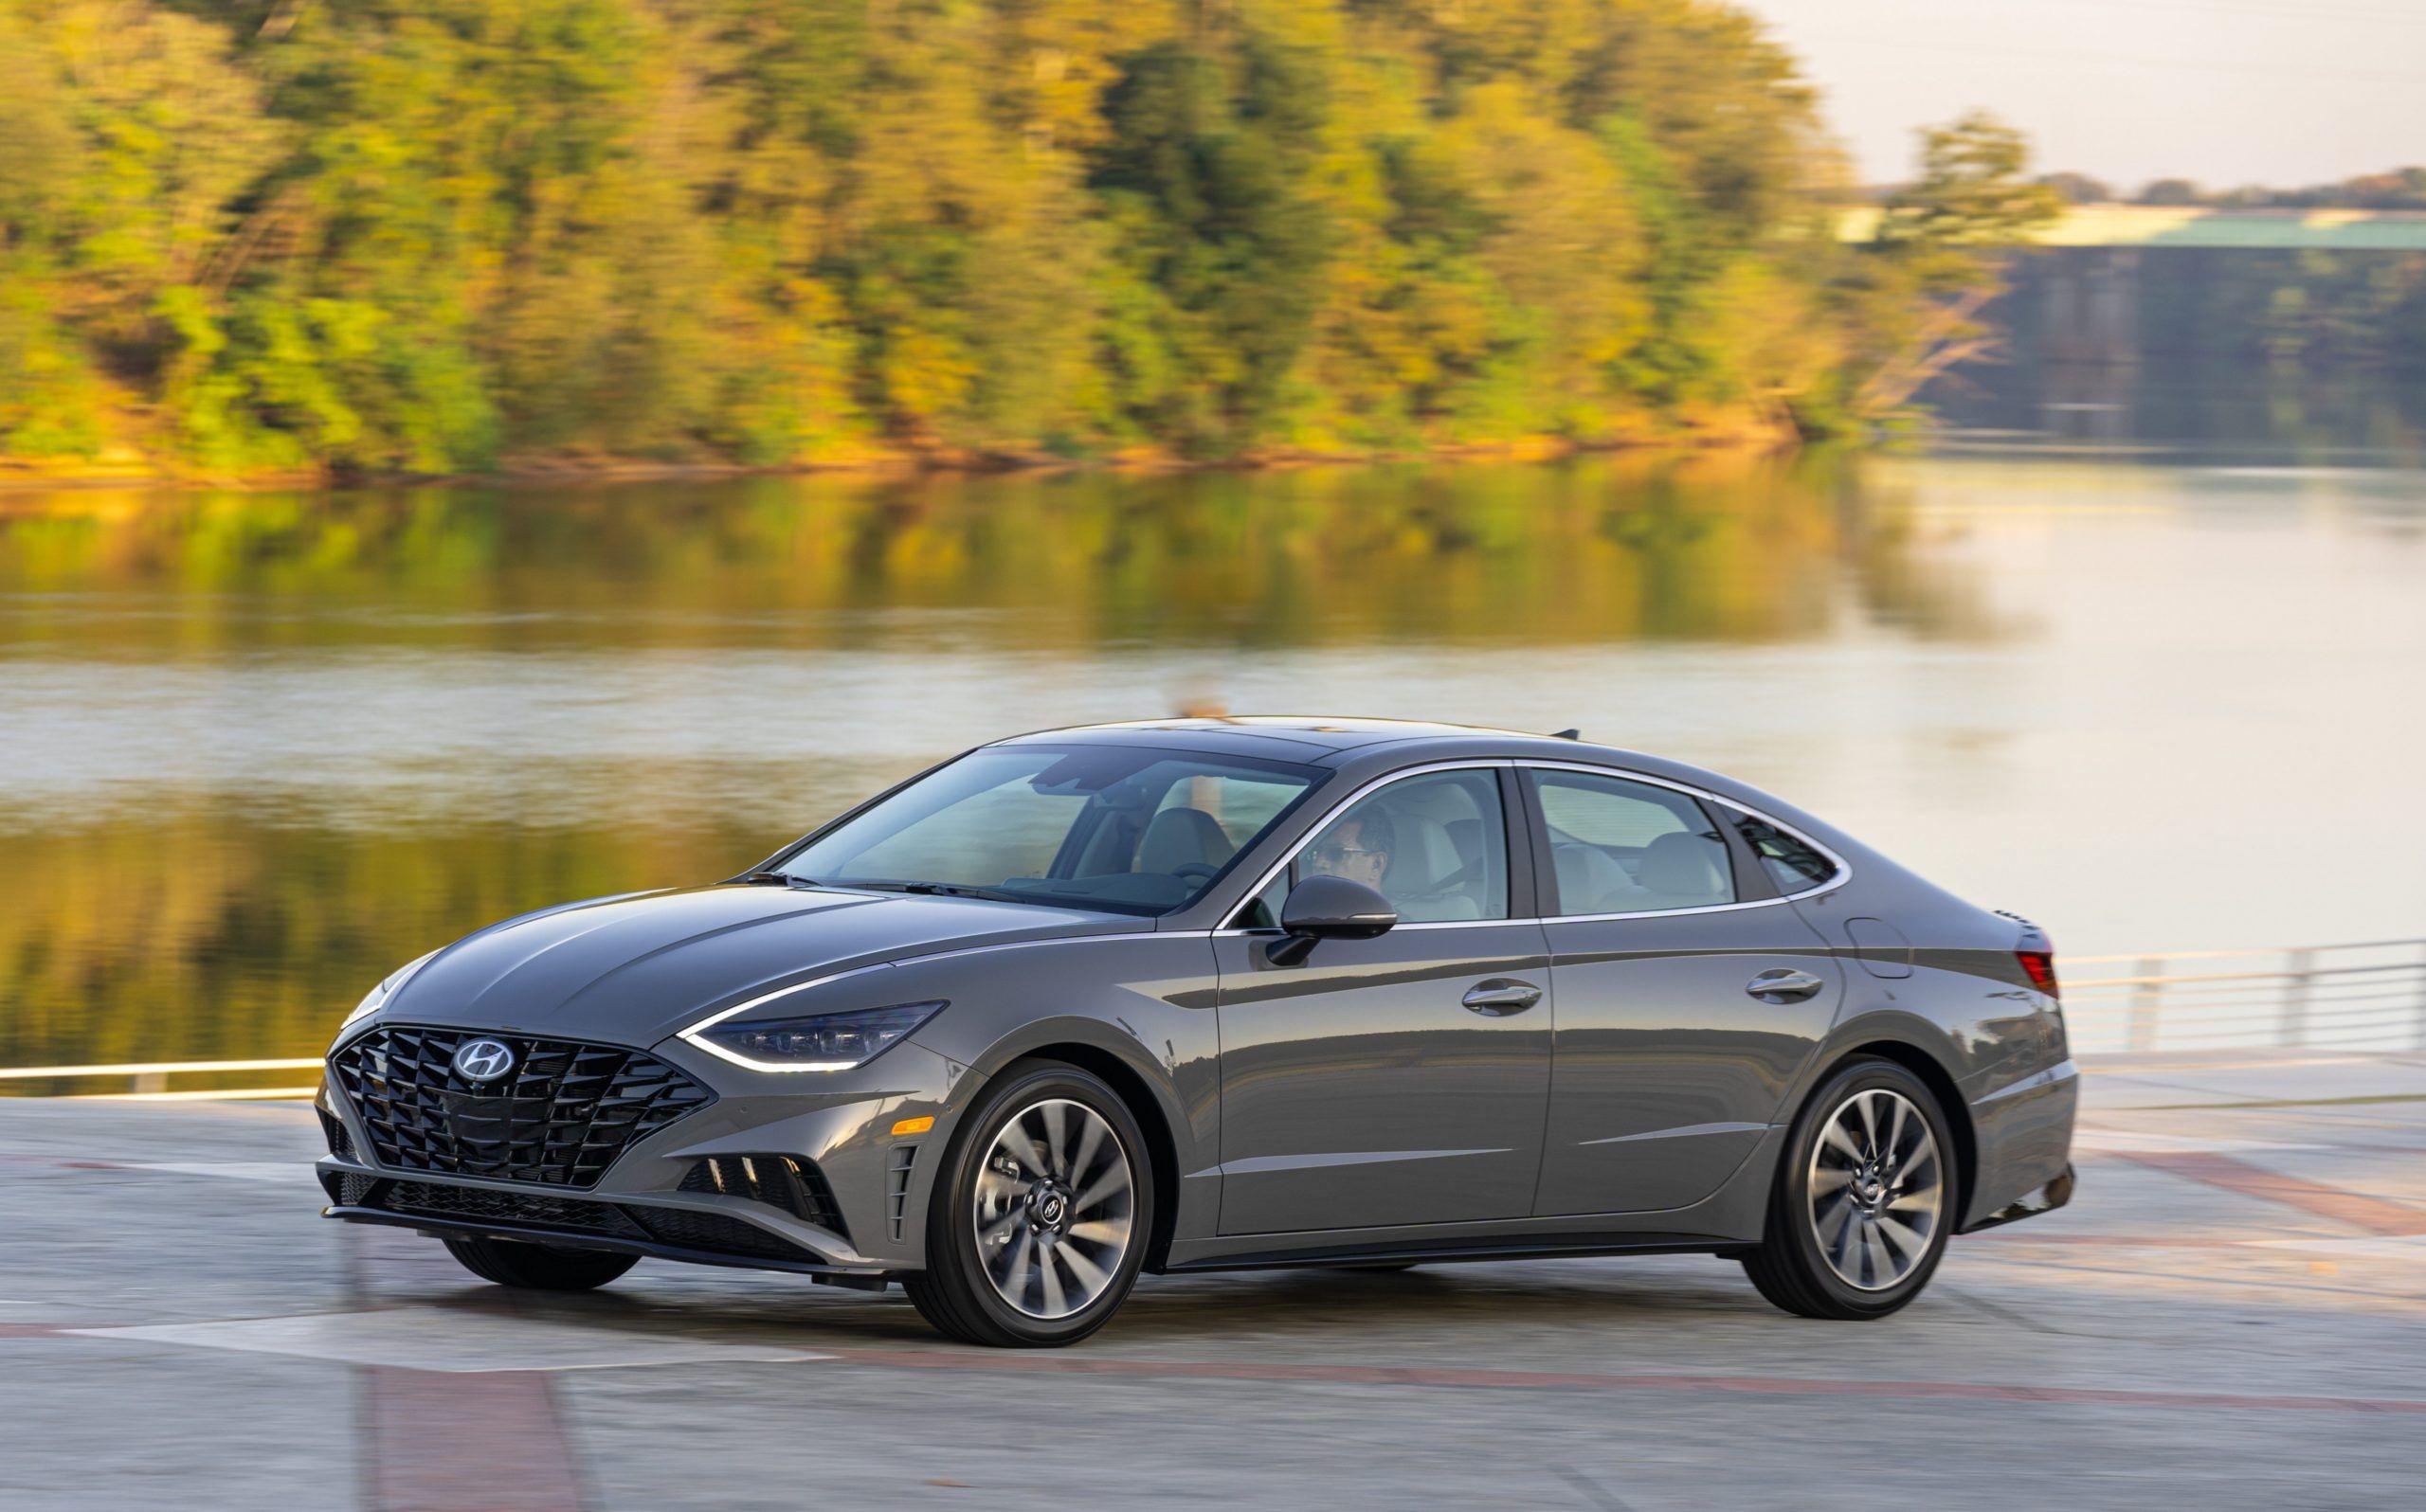 5 Features Of 2020 Hyundai Canada Design That Make Everyone